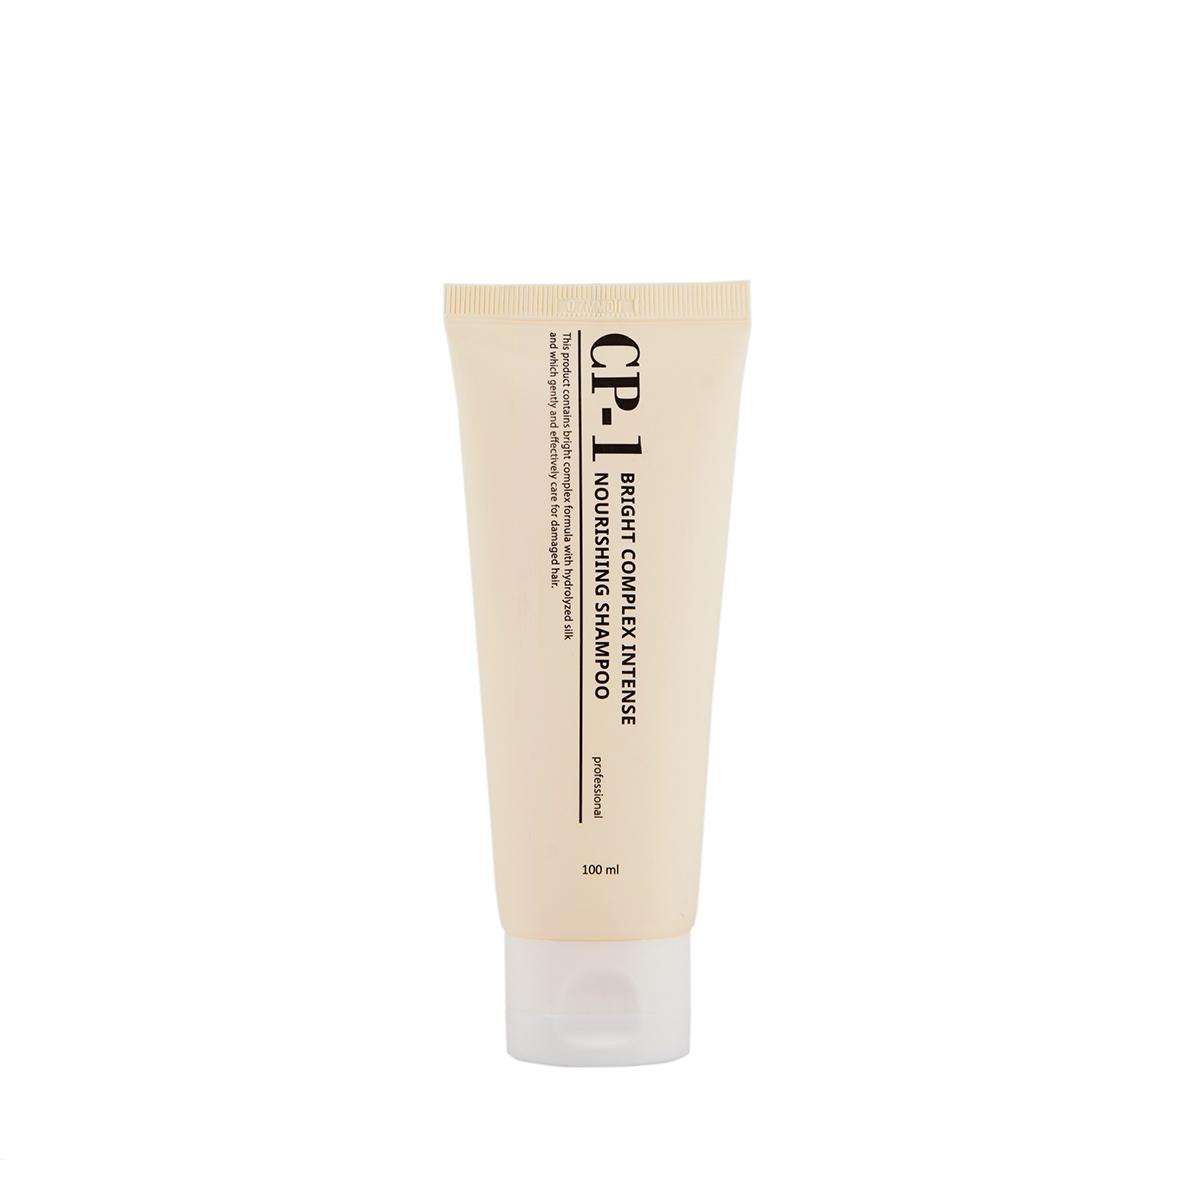 Esthetic House Протеиновый шампунь CP-1 BC Intense Nourishing Shampoo, 100 мл